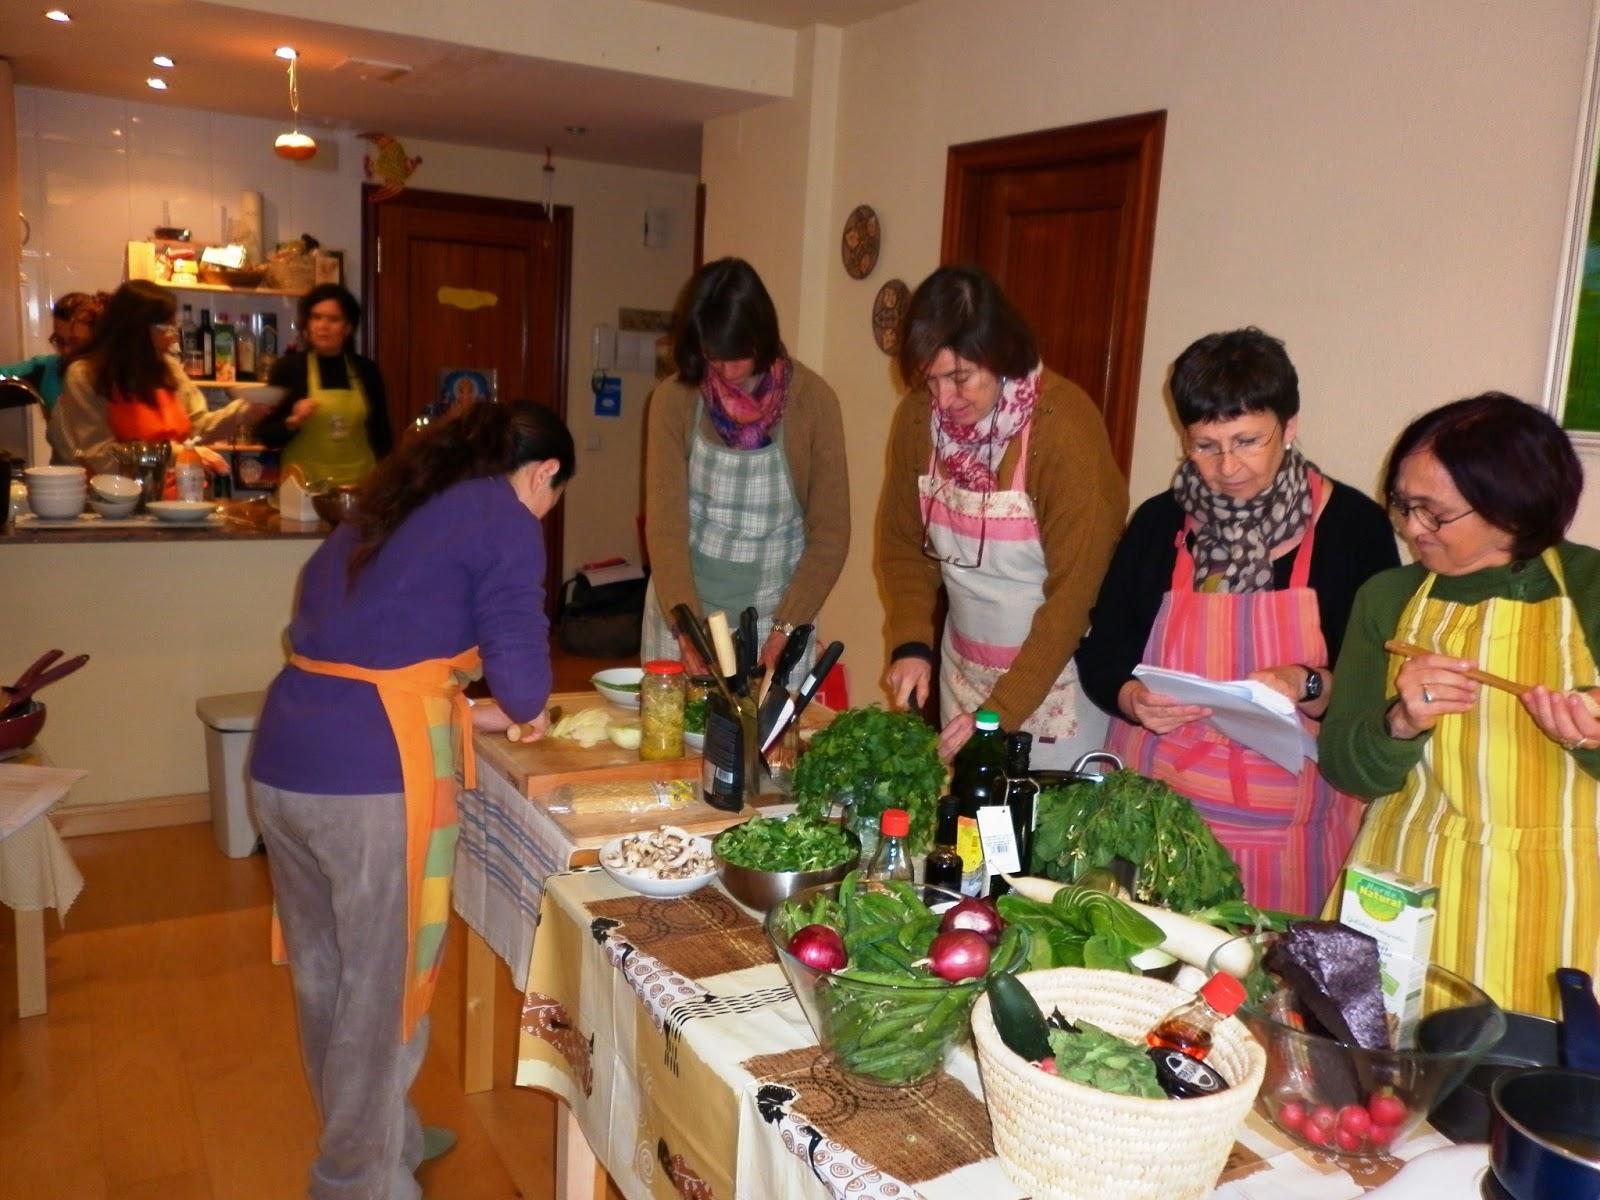 Cocina macrobi tica escuela ca l 39 agn s for Cocina macrobiotica